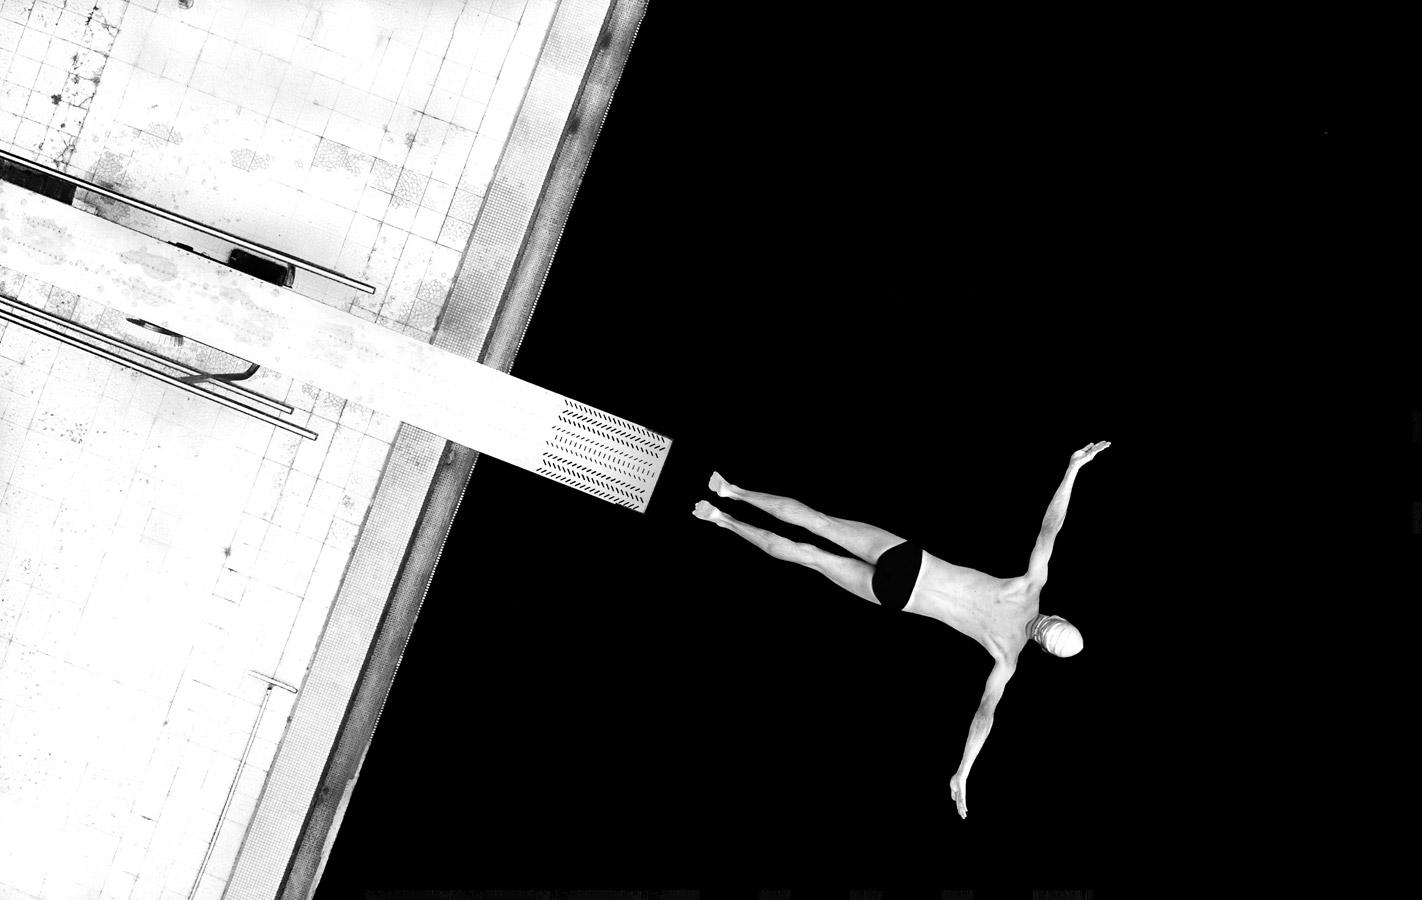 Ангел, © Луис Алонсо Хименес Сильва, Второе место, Конкурс фотографий с дрона DrAw